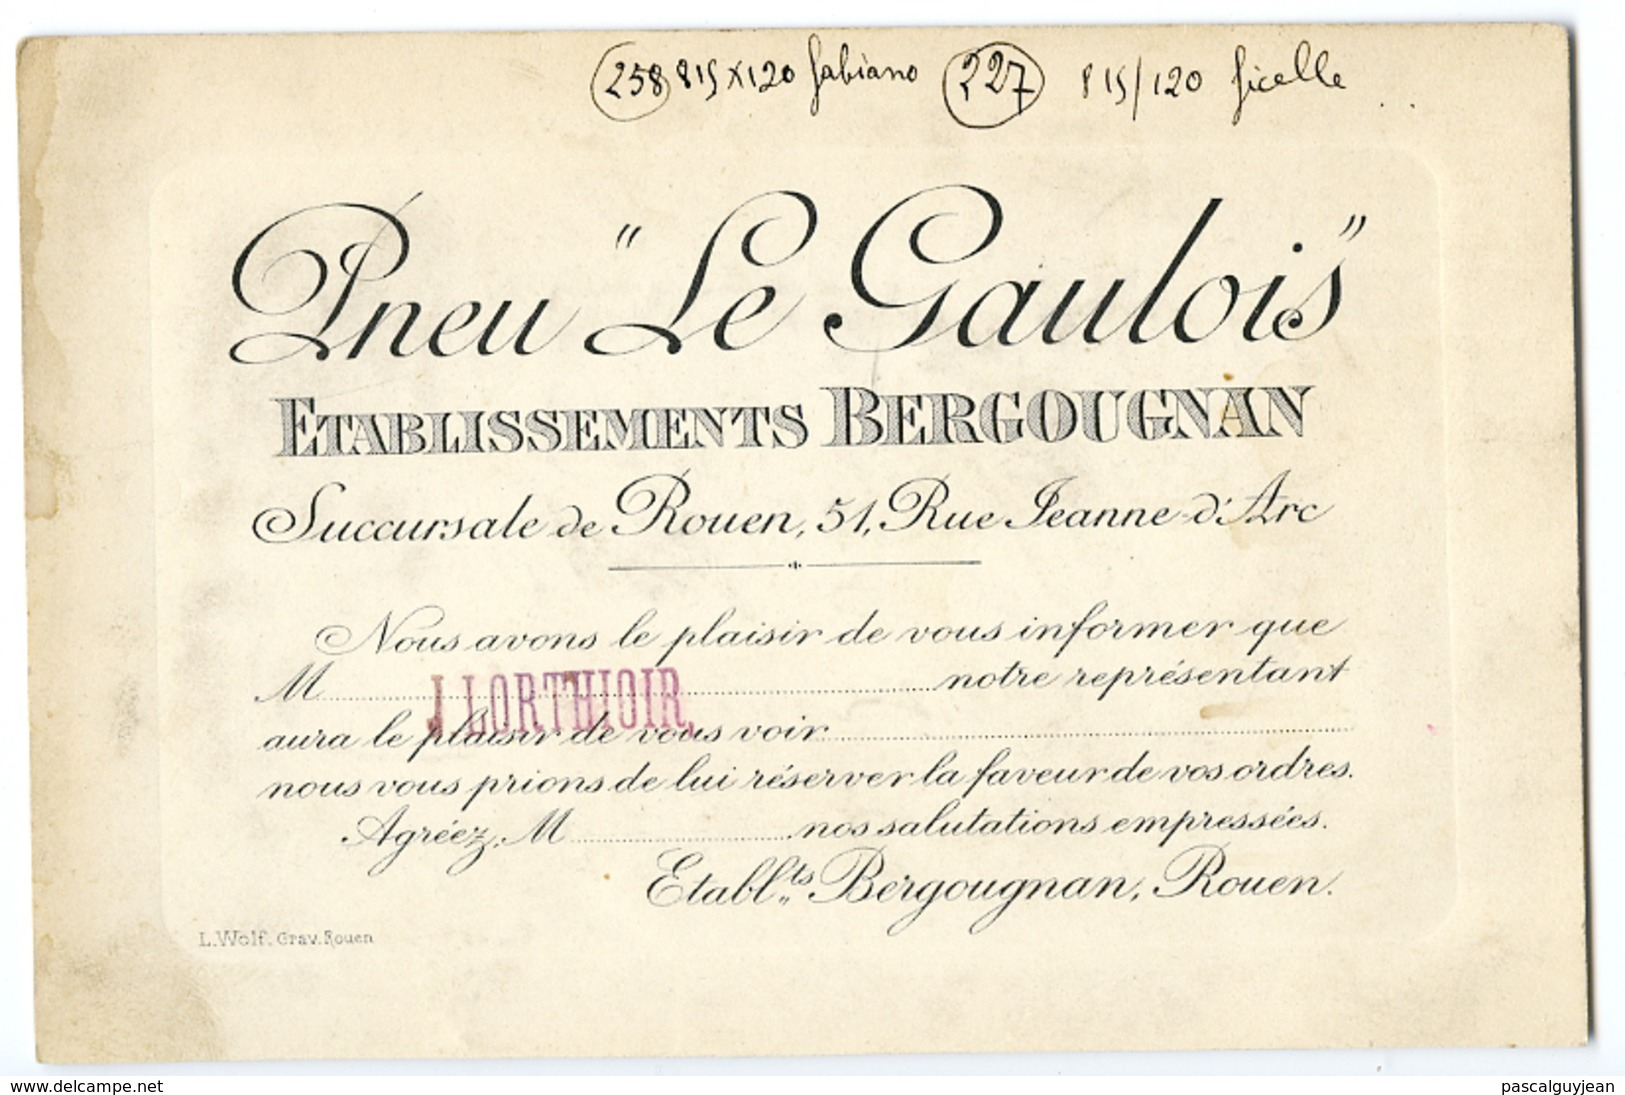 CARTE DE VISITE PNEU LE GAULOIS - ETABLISSEMENTS BERGOUGNAN, ROUEN - Tarjetas De Visita